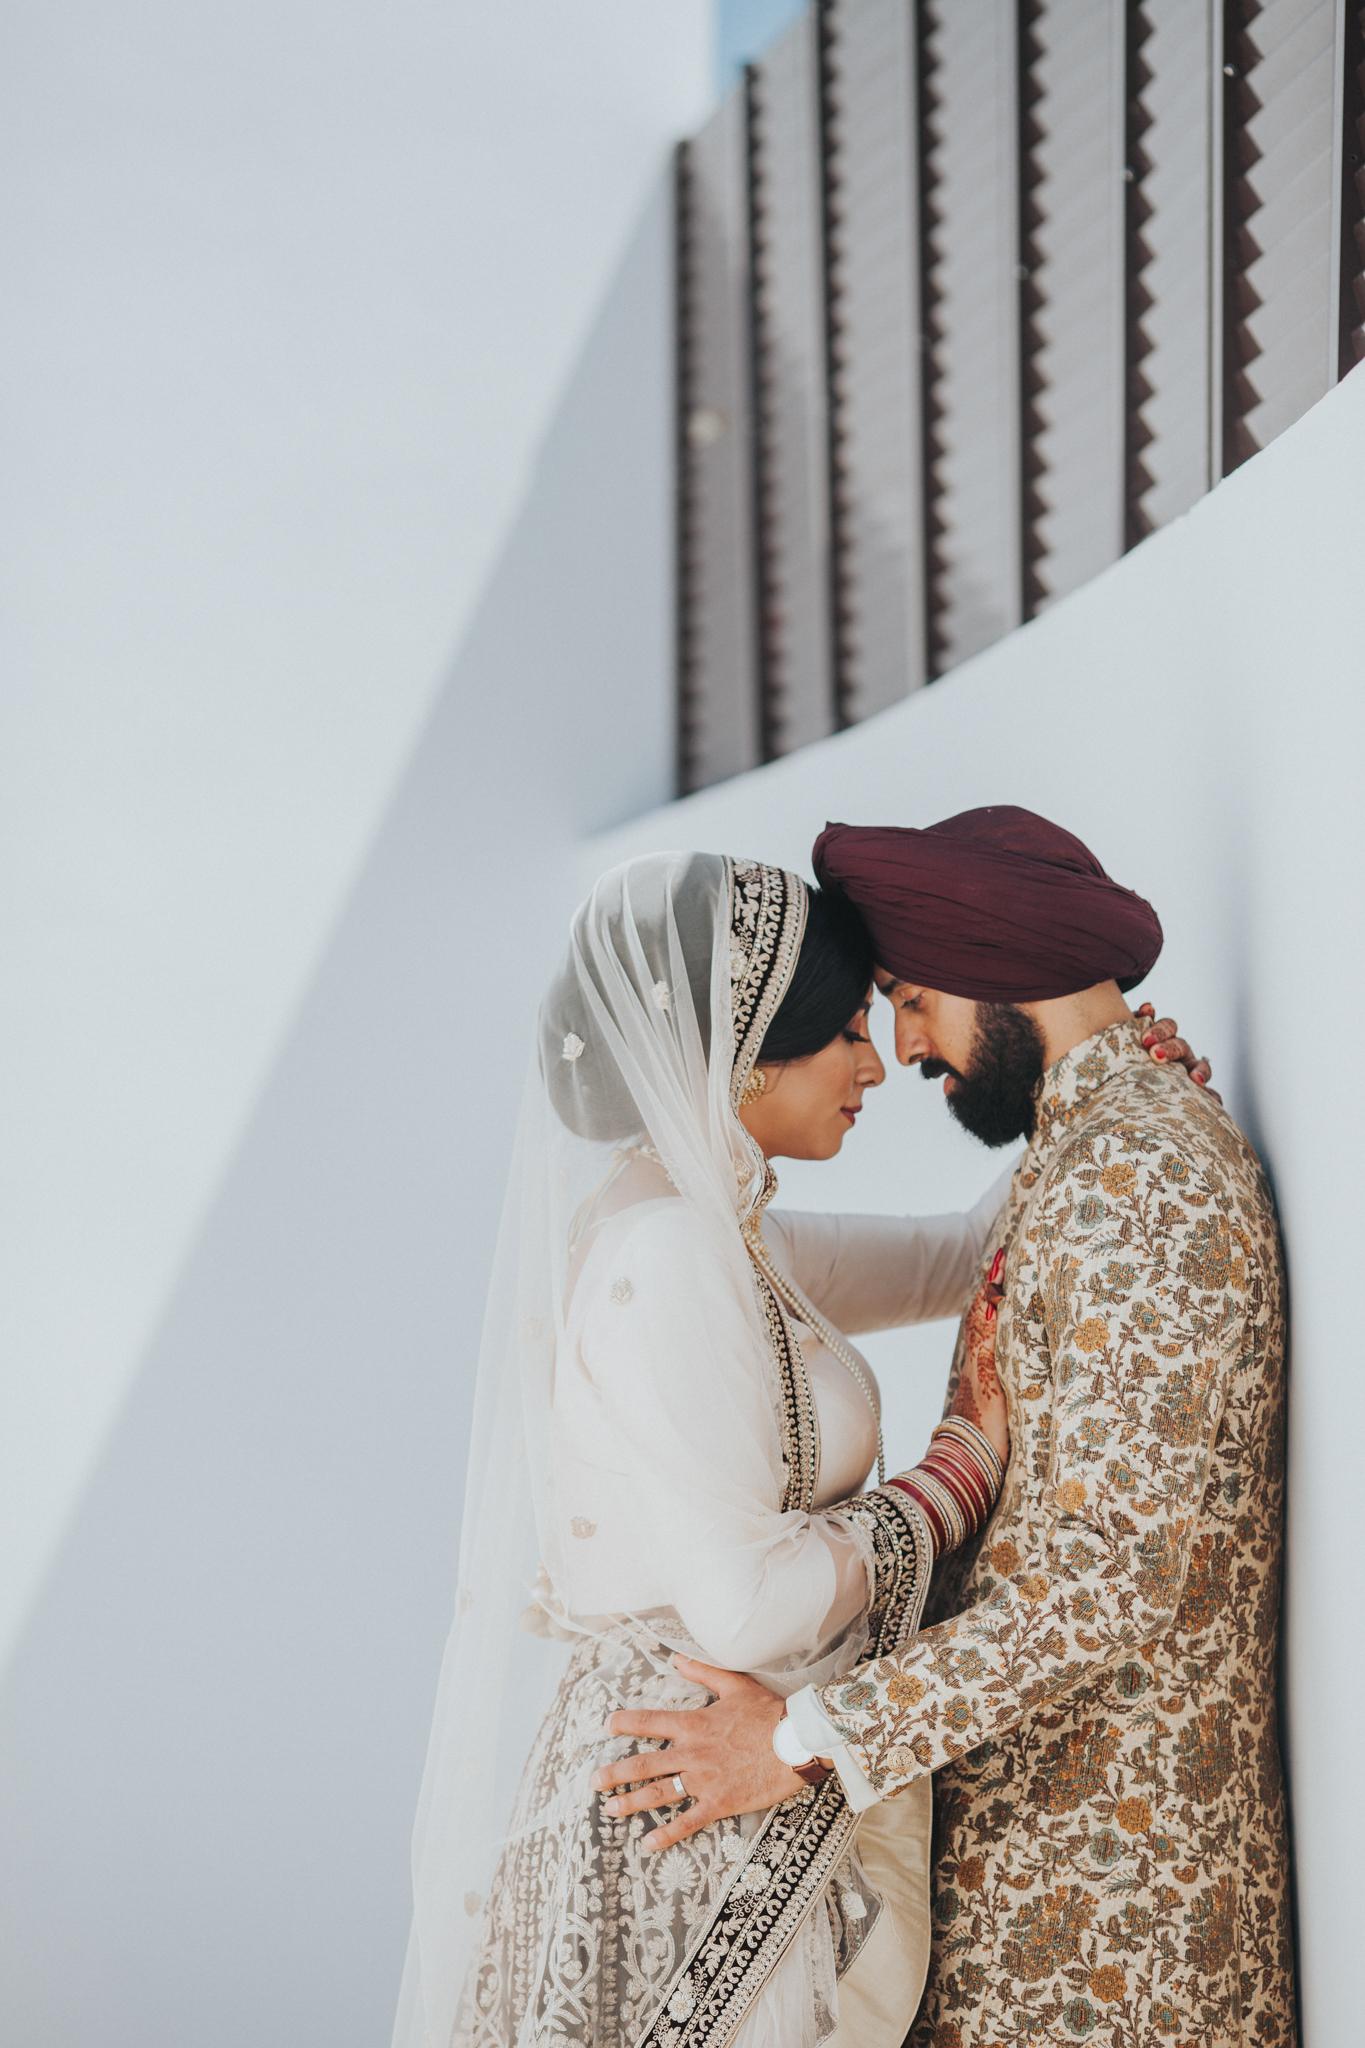 jessicajag_wedding_blush656.jpg